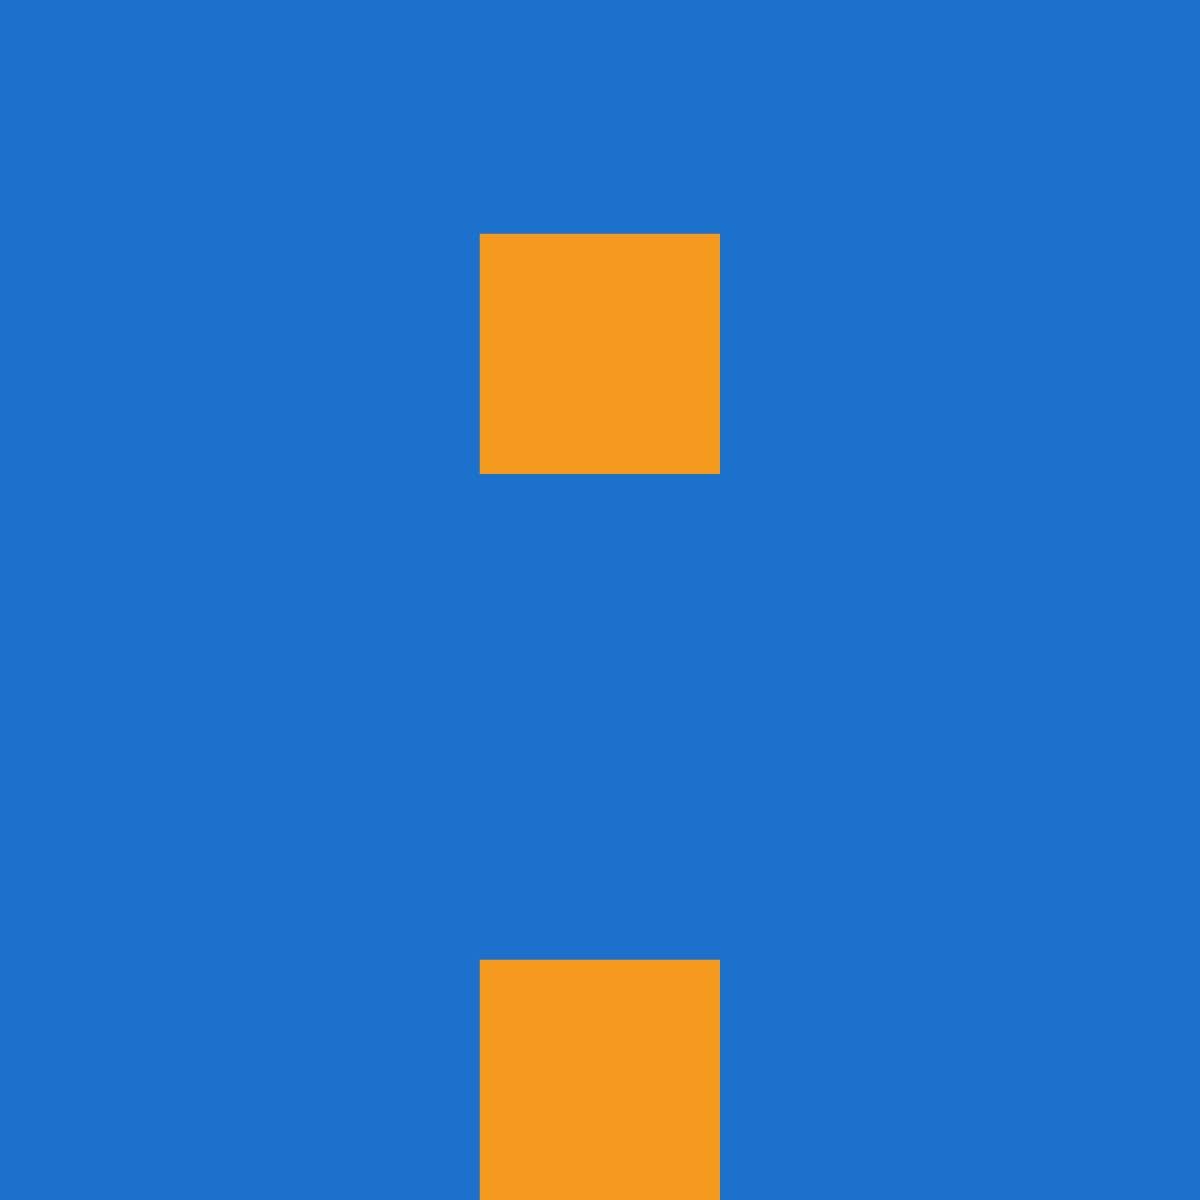 Aprendizaje De Las Matemáticas De Primaria Coursera